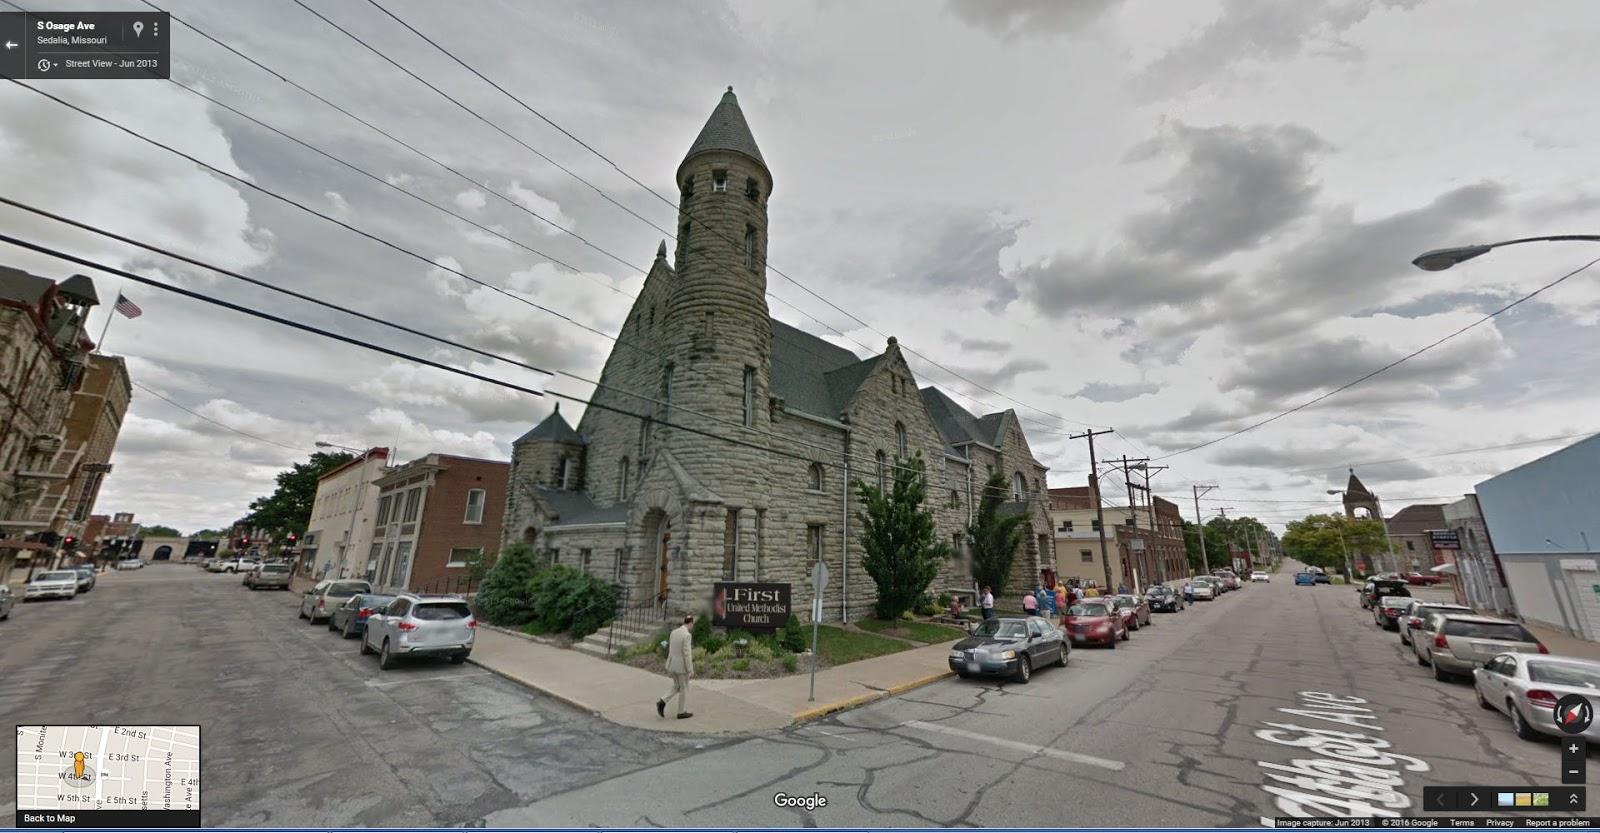 Capt  Spaulding's World: Fire destroys First United Methodist Church